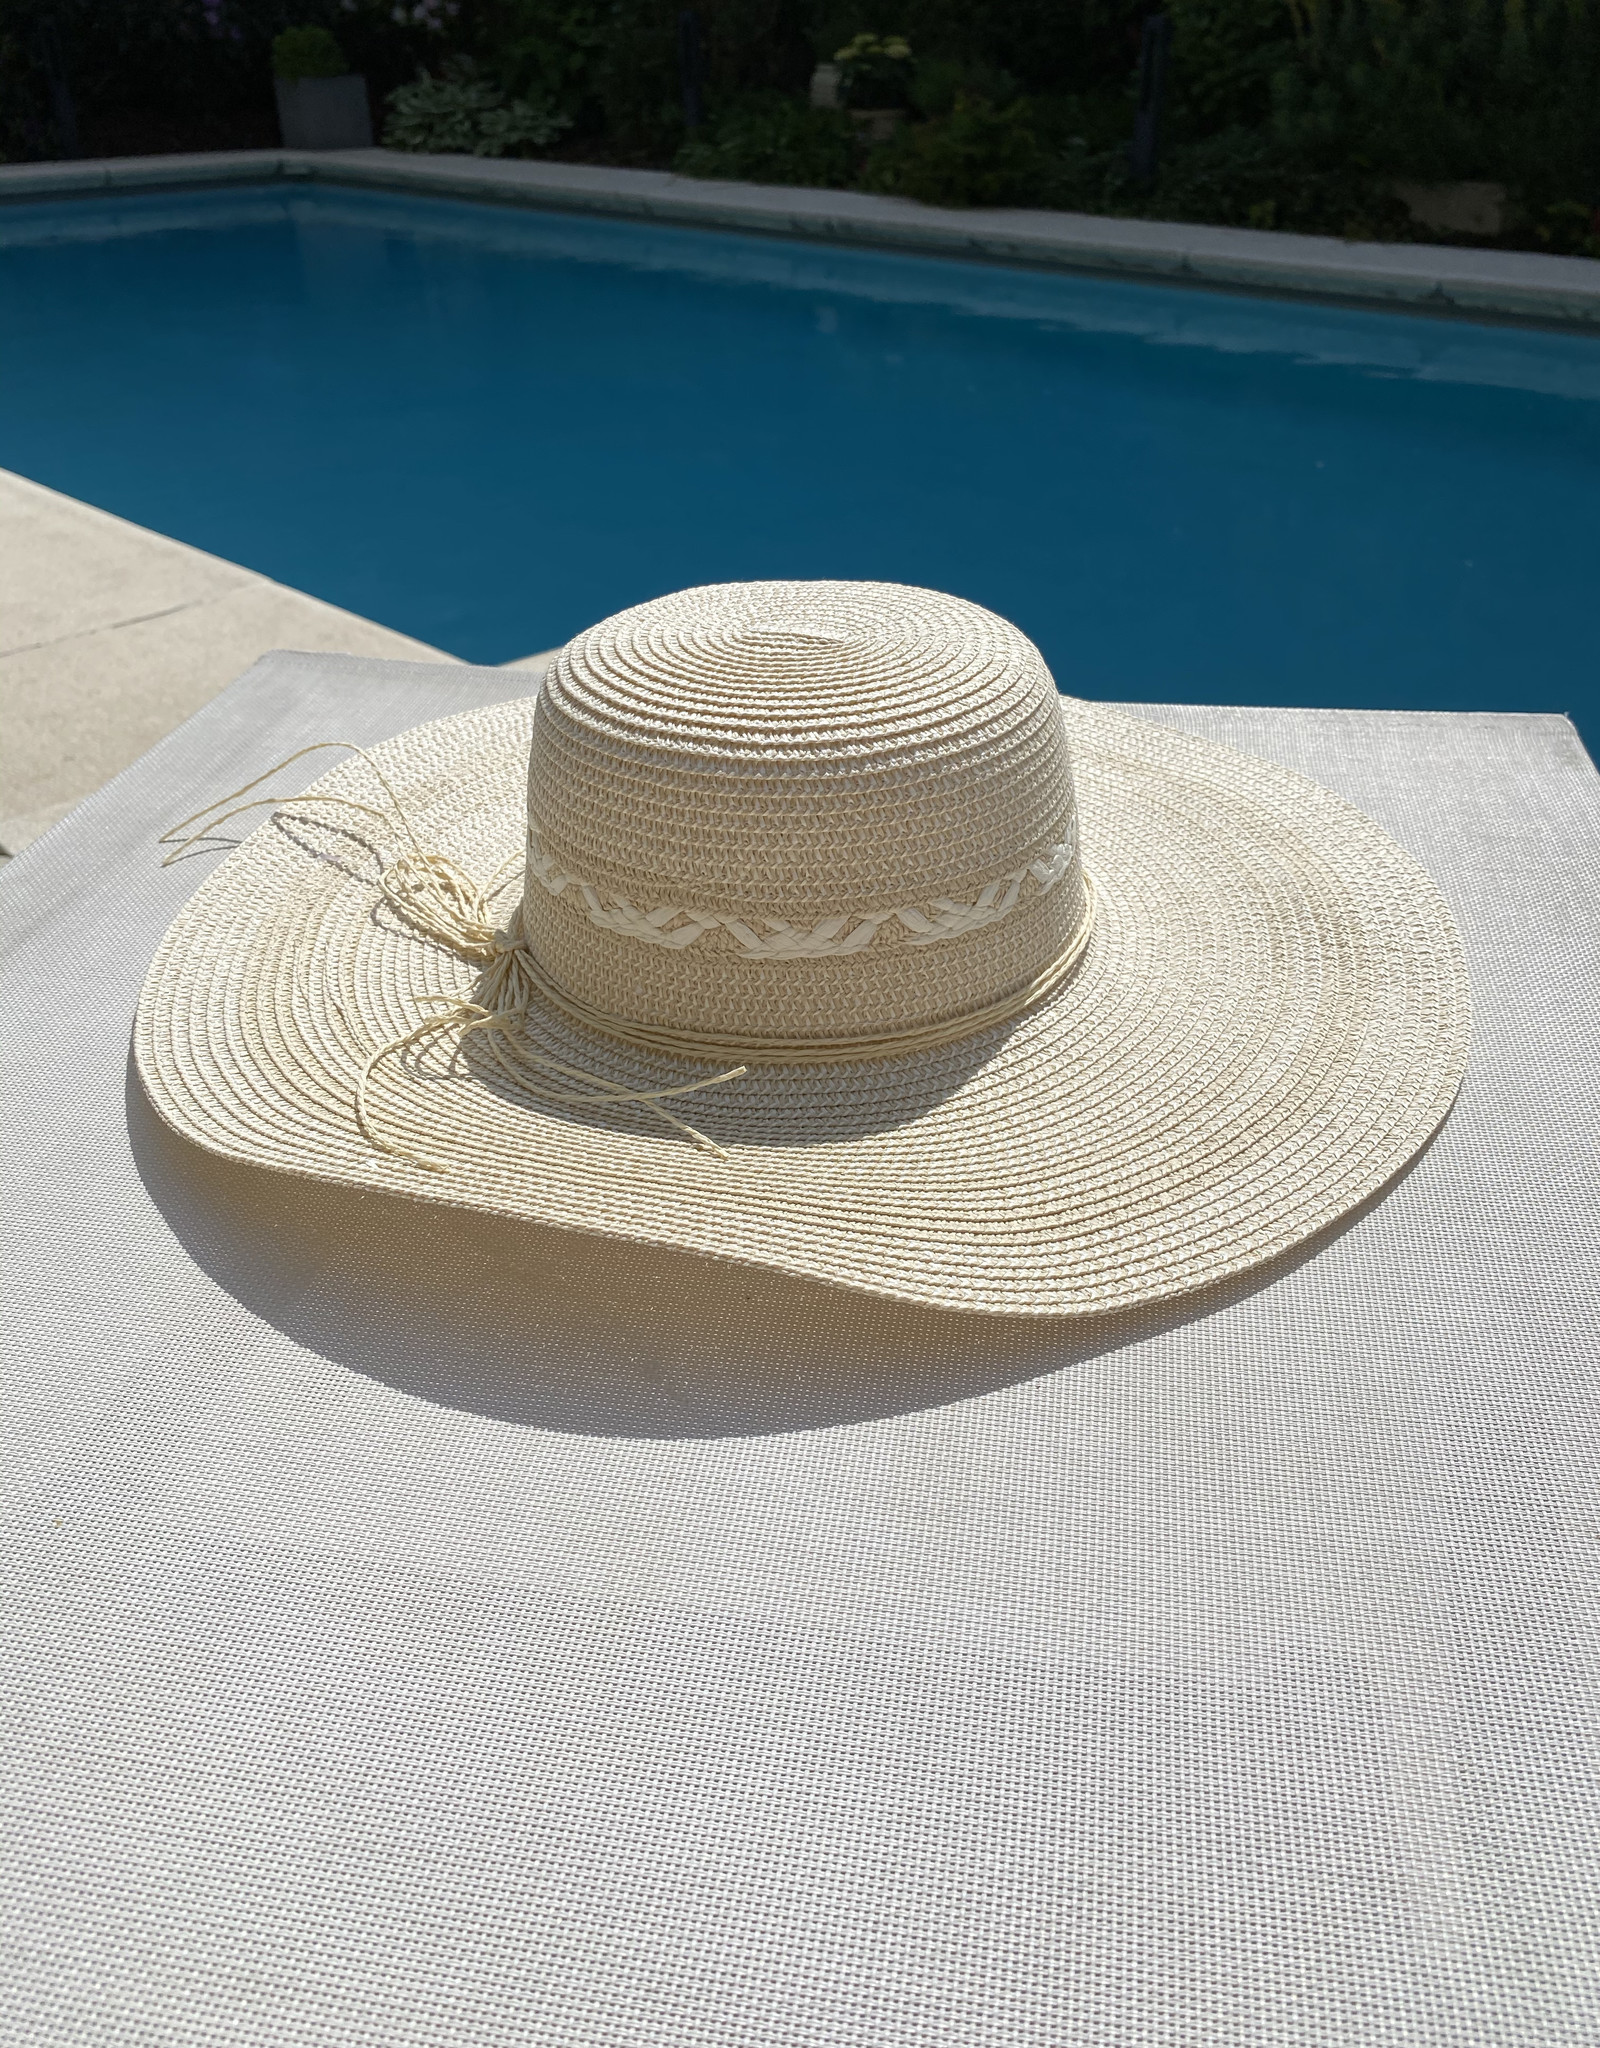 Classy styling hat